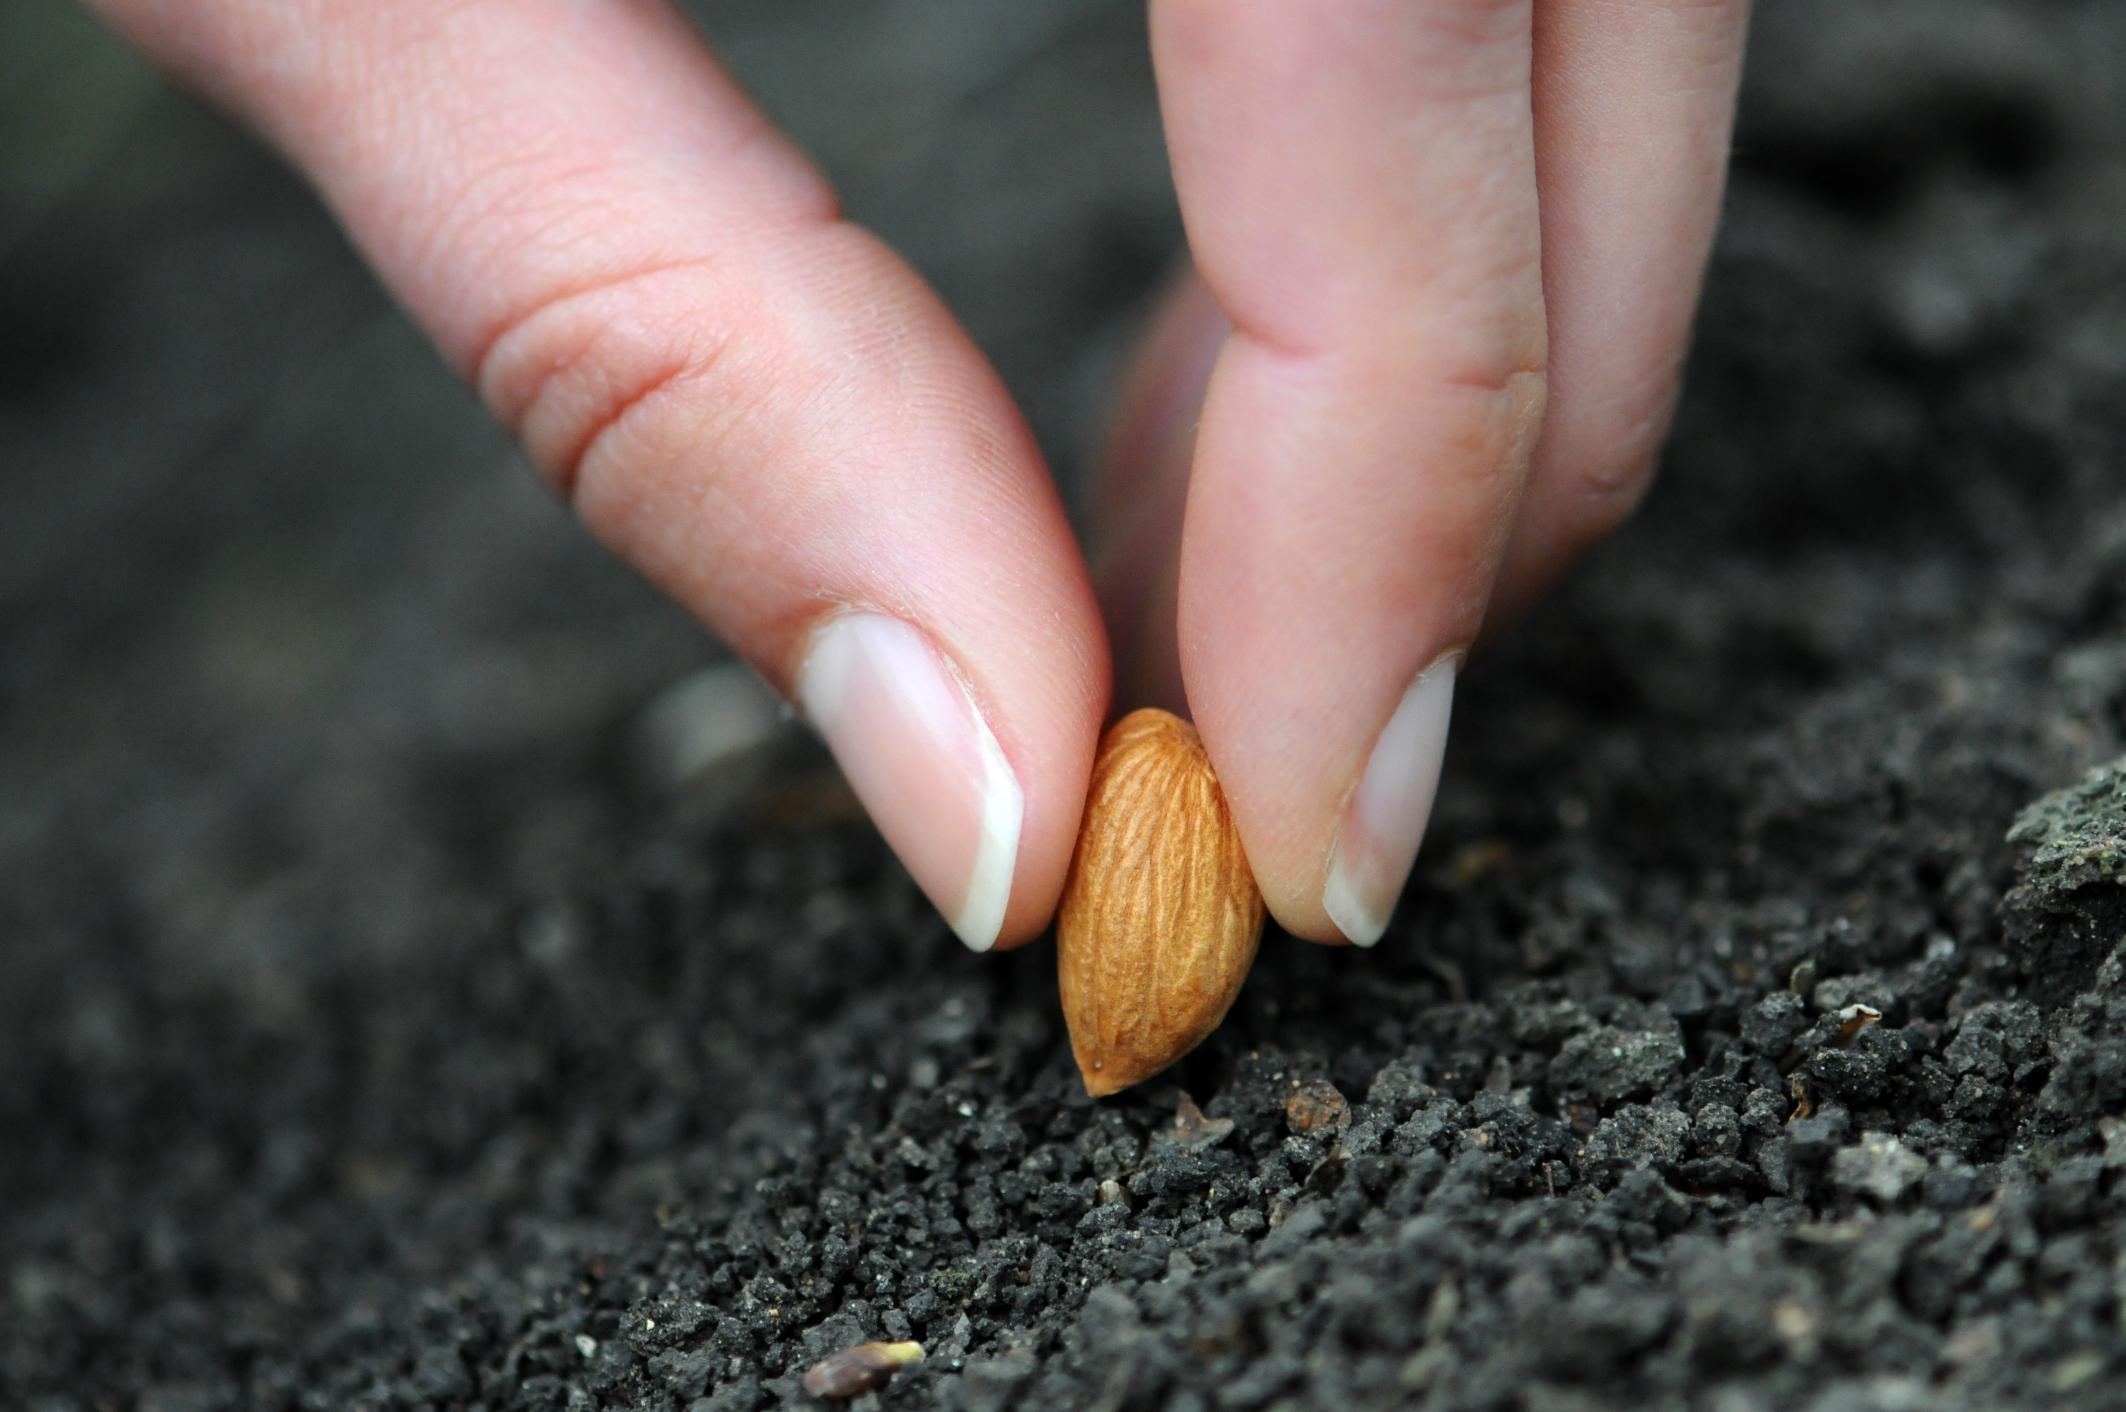 Посадка семени картинка